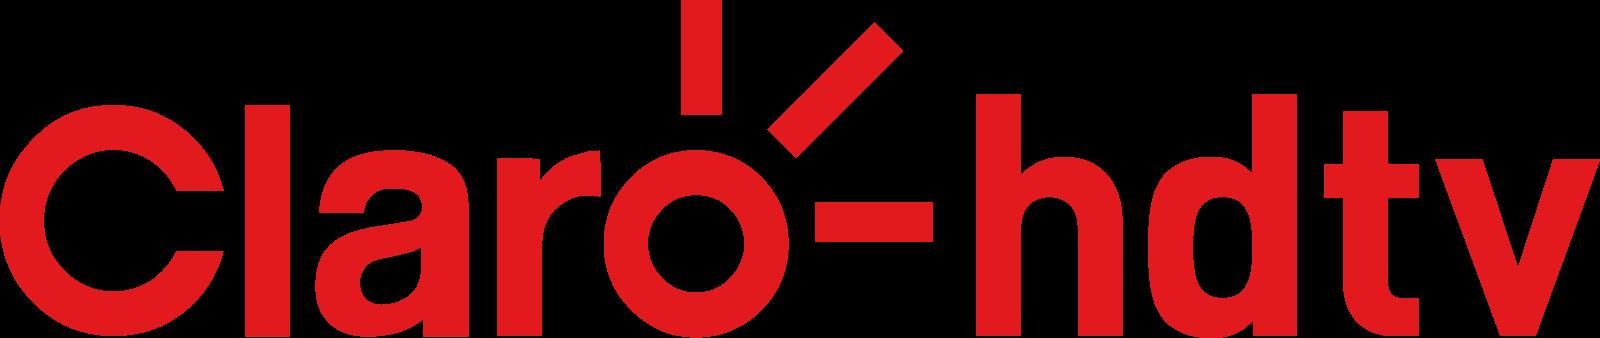 claro-hdtv-logo-4